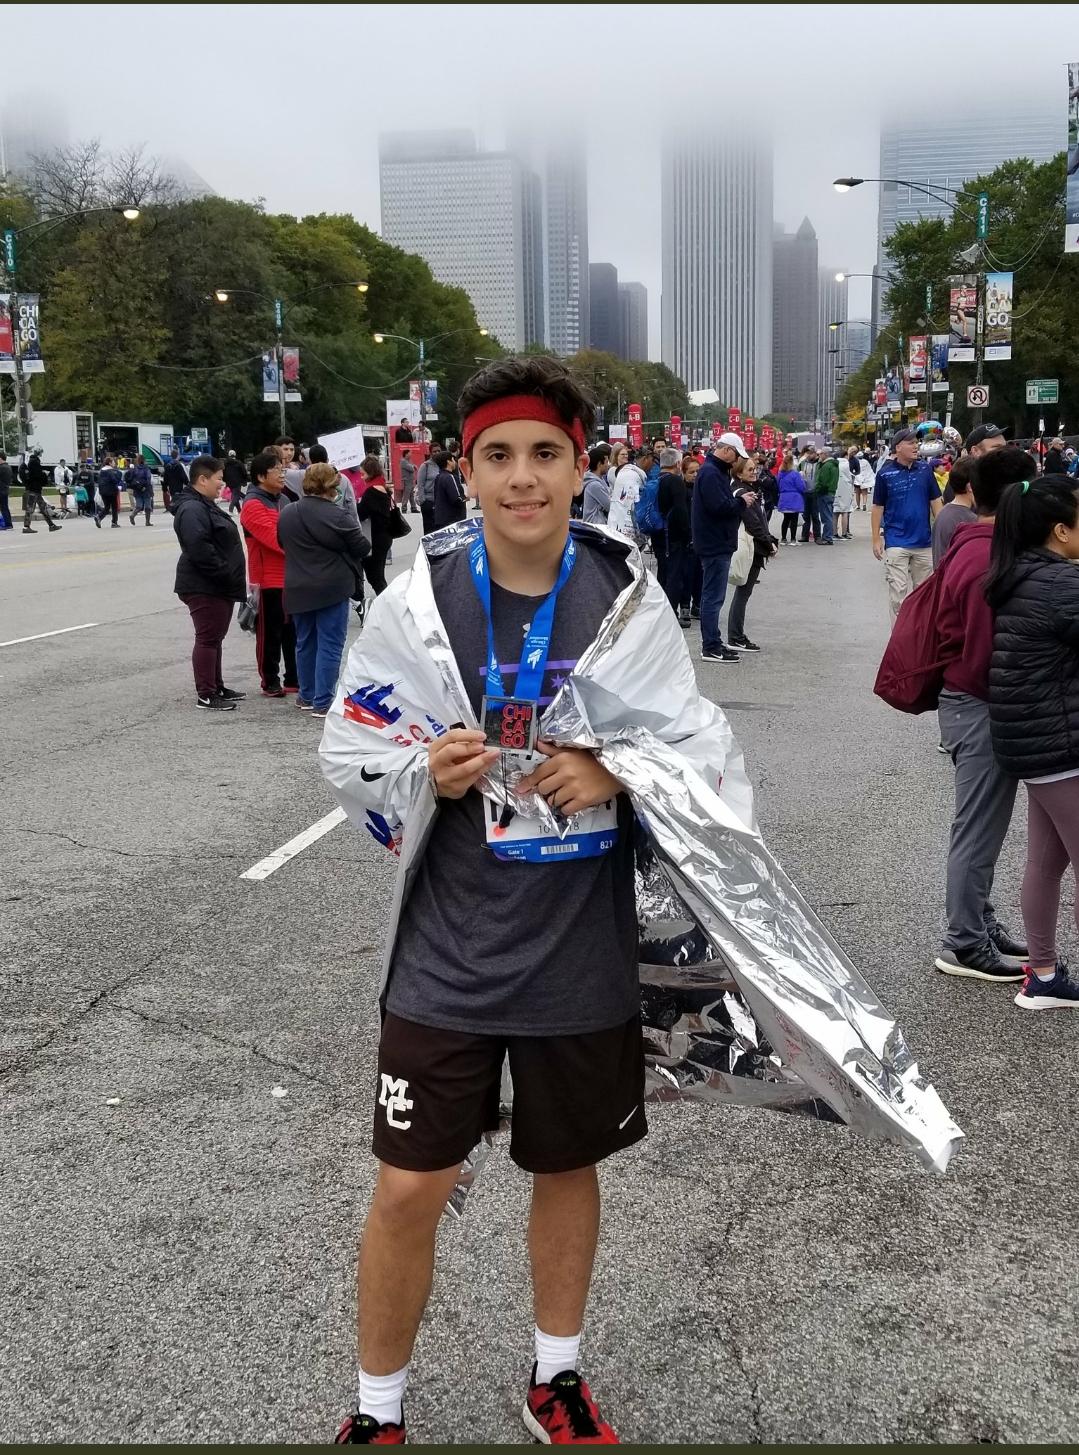 Cristian Sanchez still smiling after running 26.2 miles.